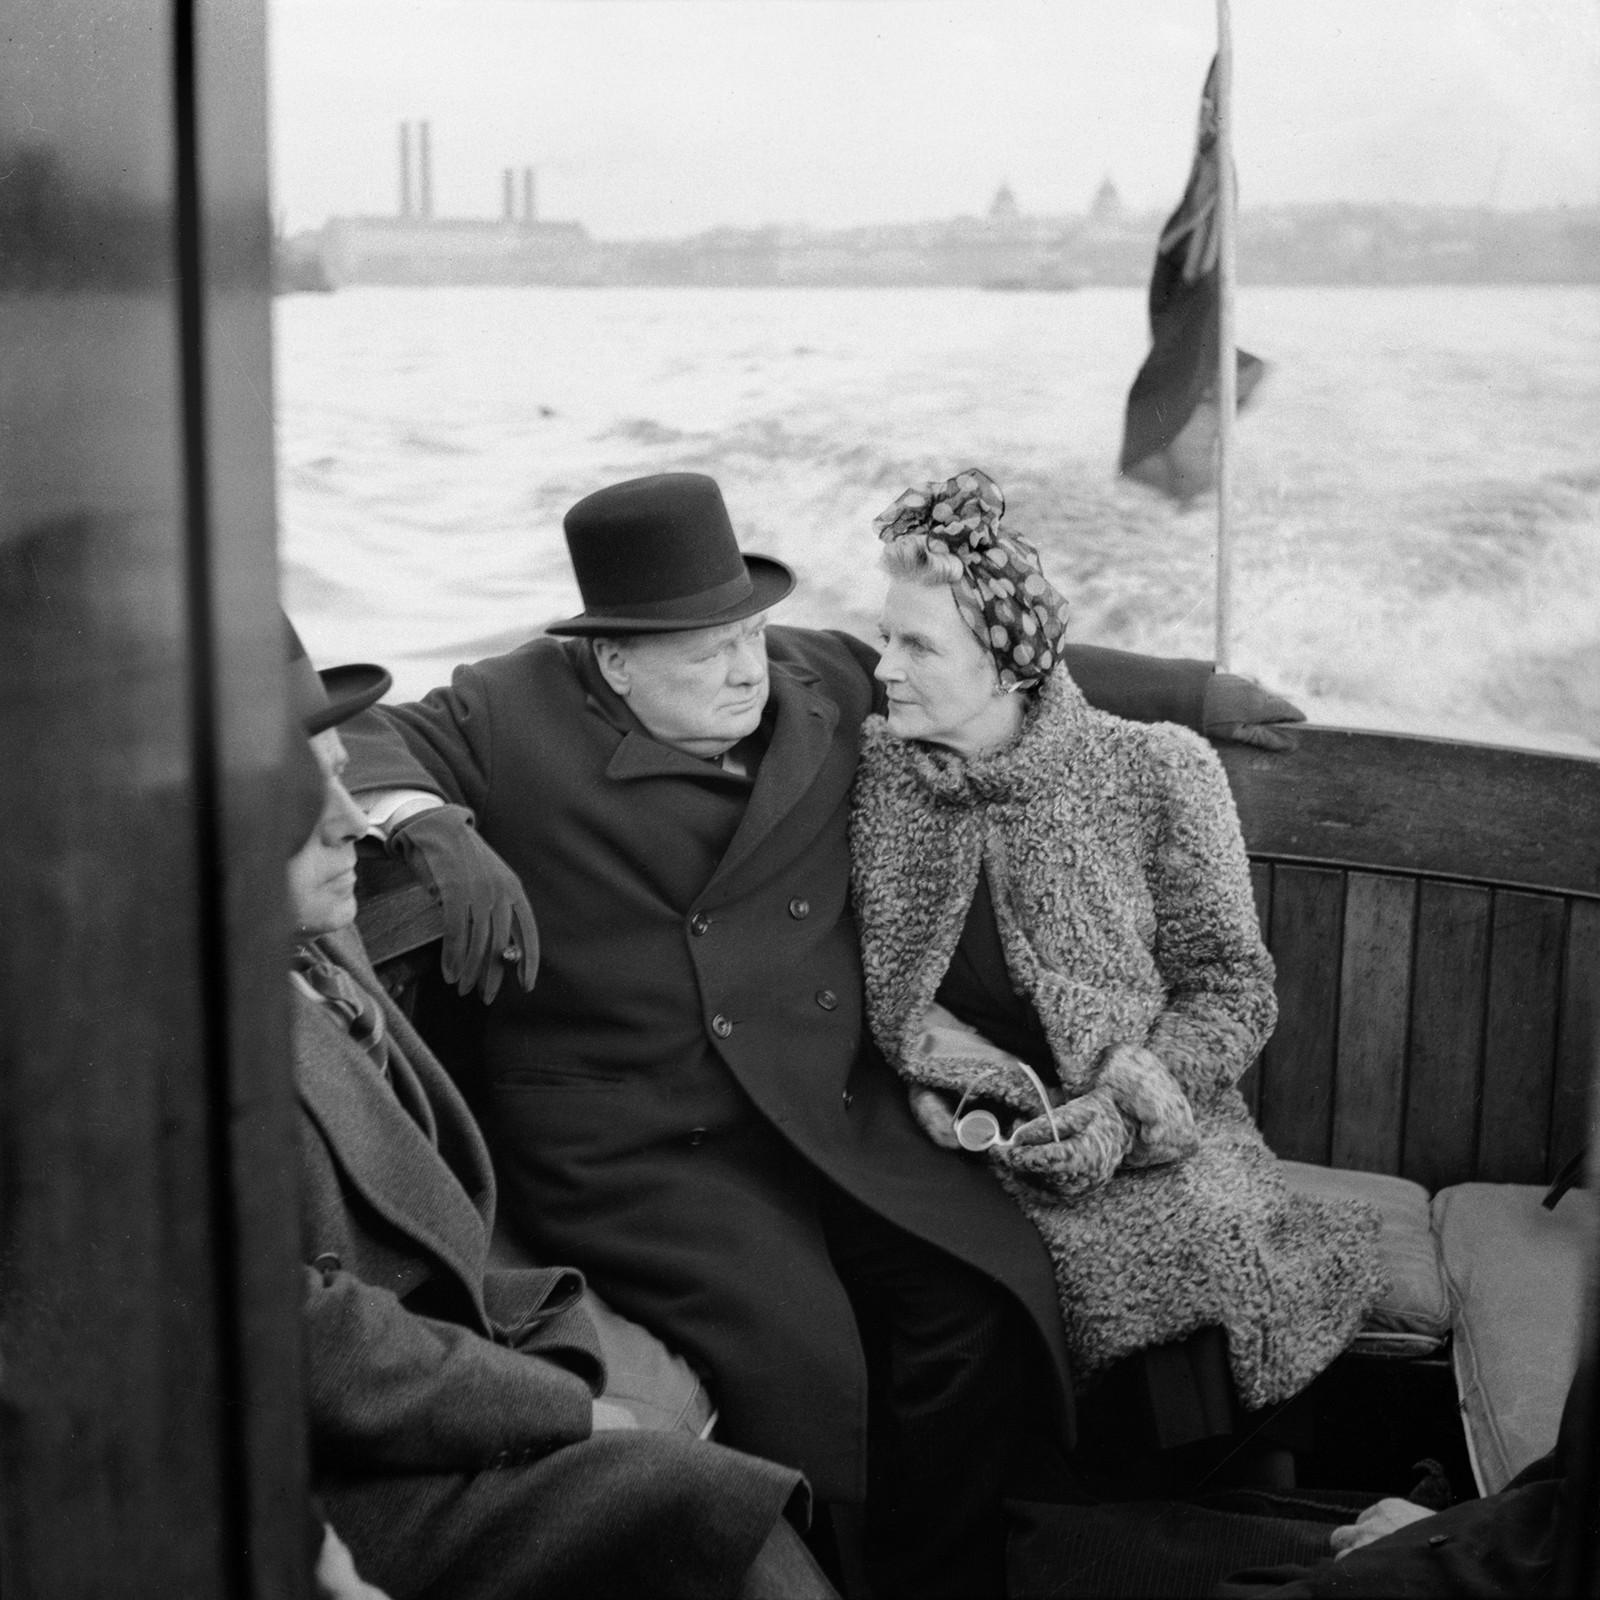 Winston Churchill med kona Clementine, på en patruljebåt på vei mot London Havn, 25. september 1940